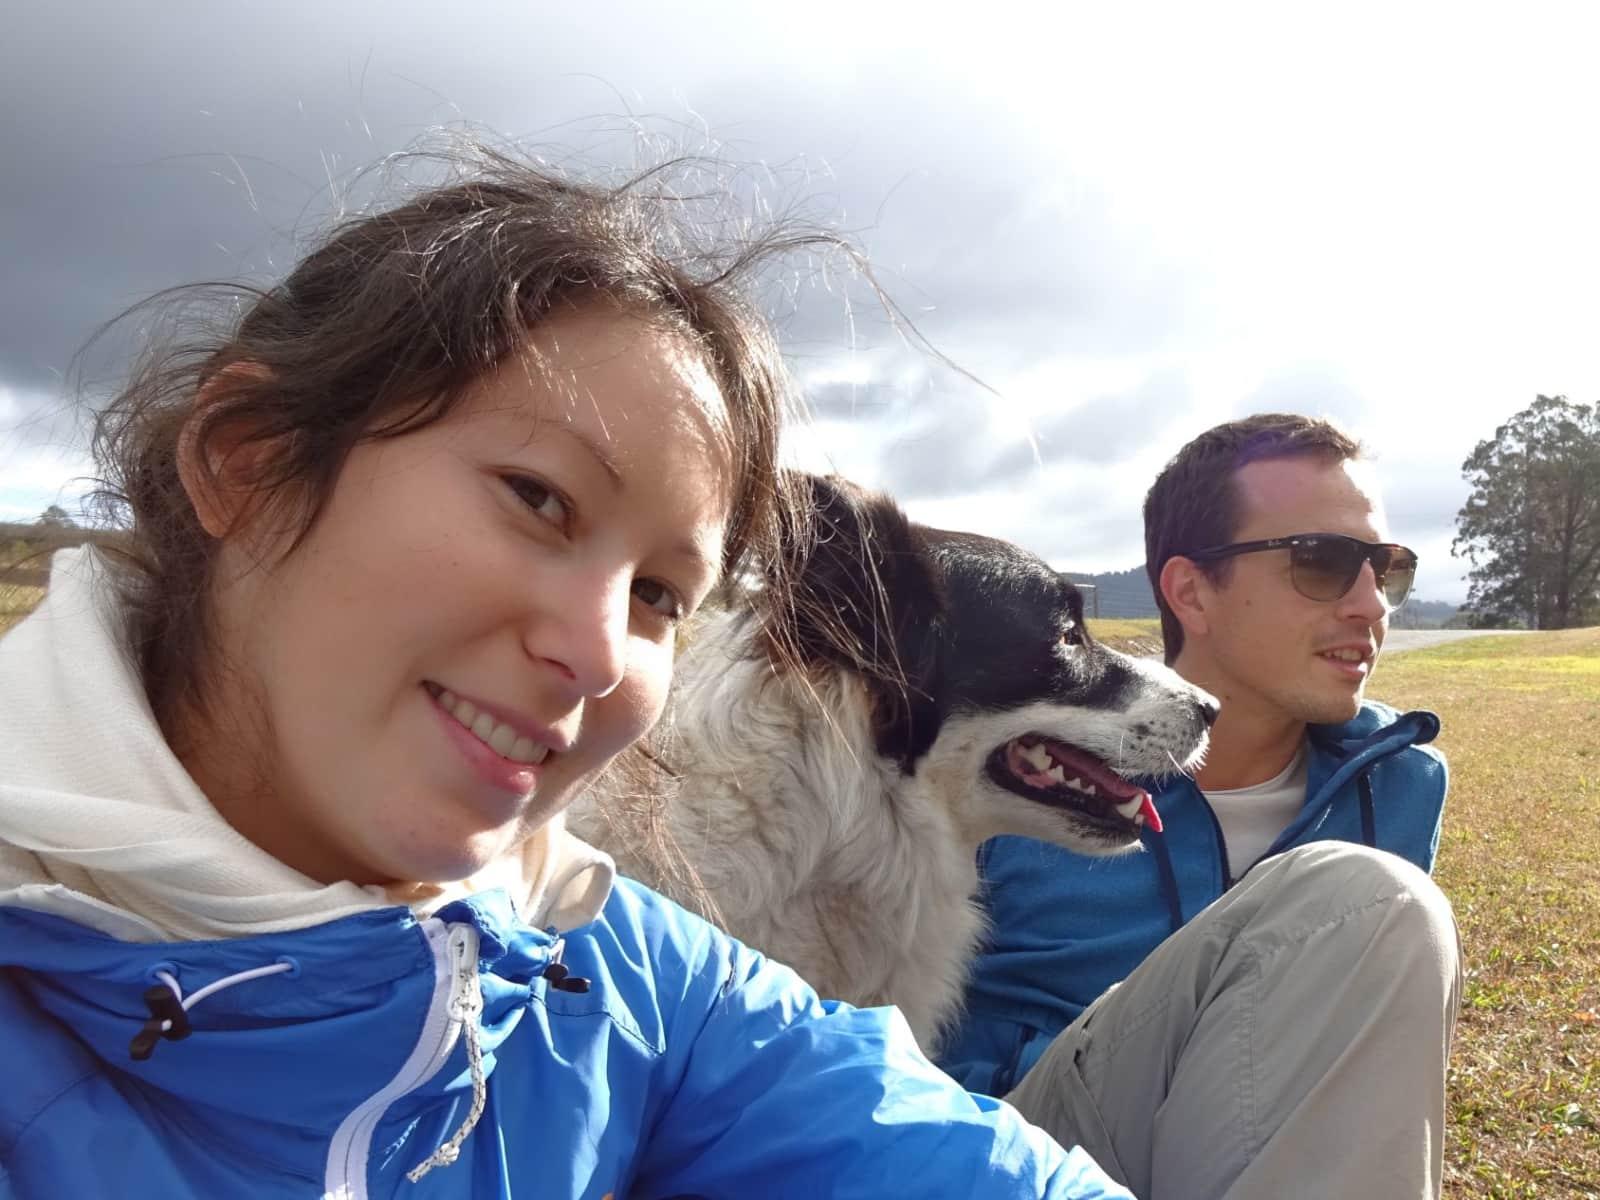 Stephanie & Janes from Munich, Germany